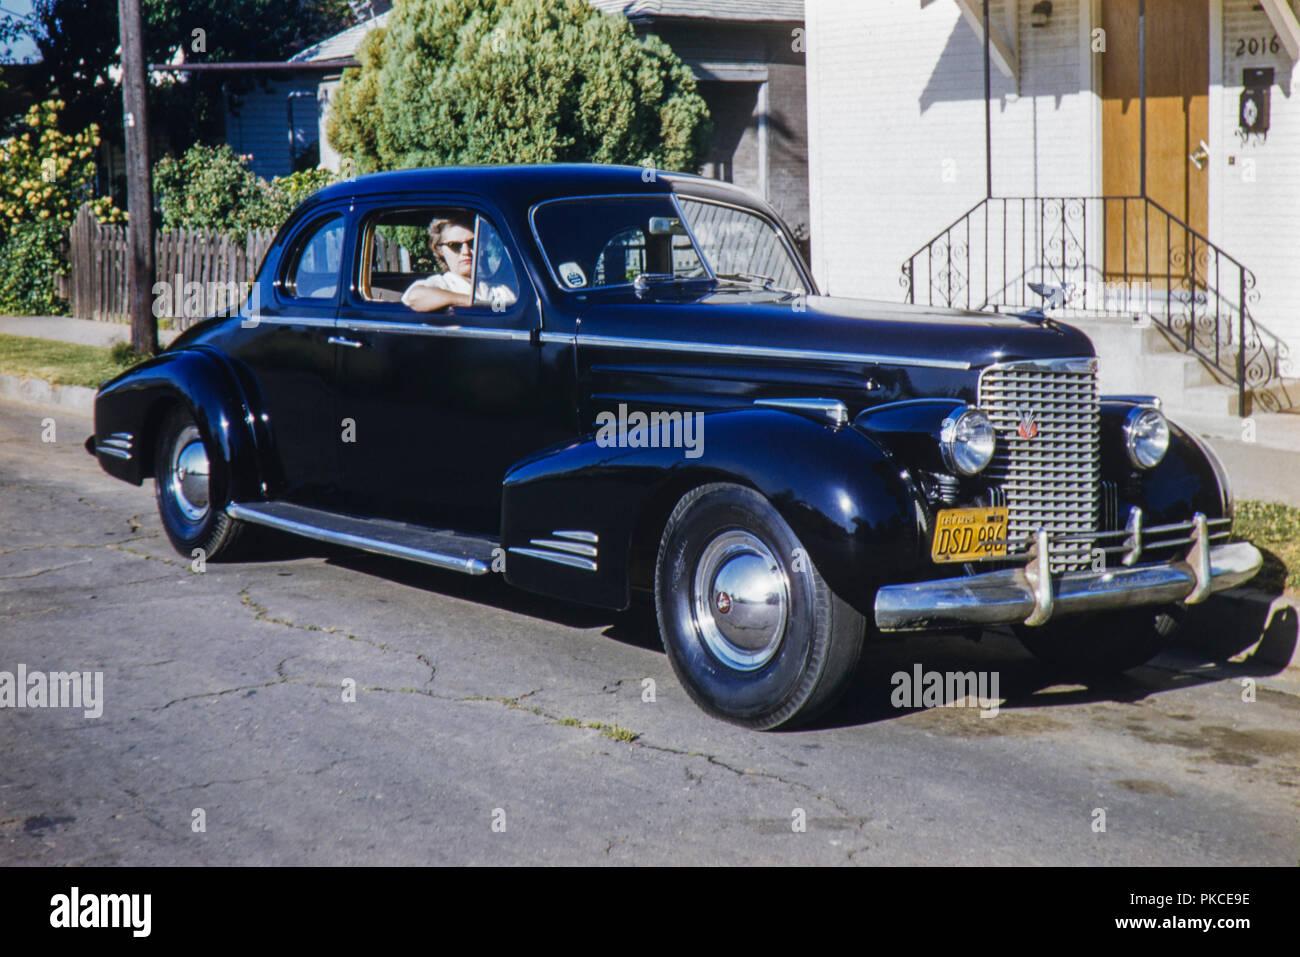 Black and chrome old 2 door Cadillac Sedan American car with a 1956